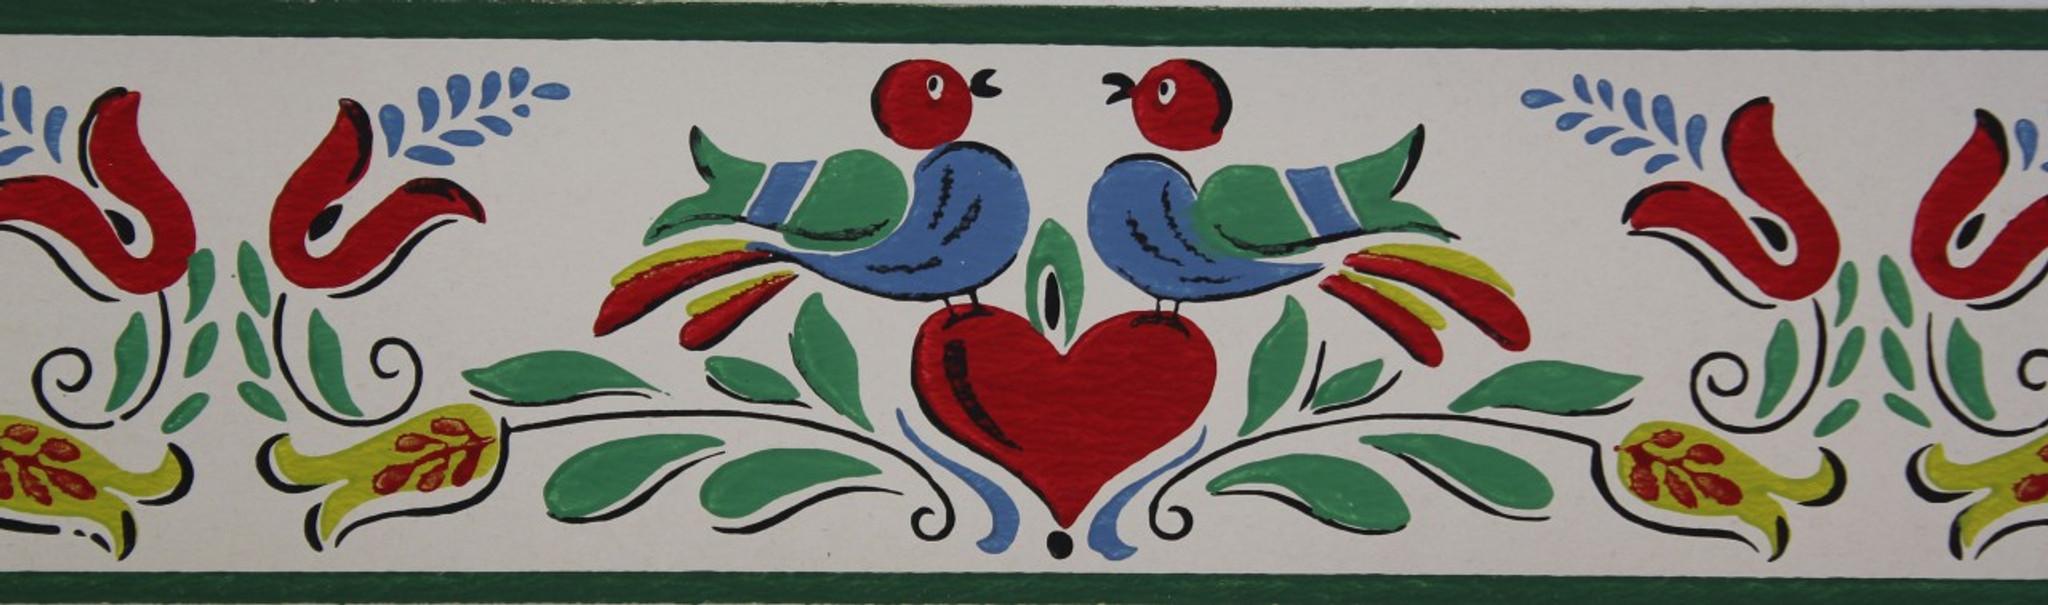 Trimz Vintage Wallpaper Border Penn Decor Rosie S Vintage Wallpaper